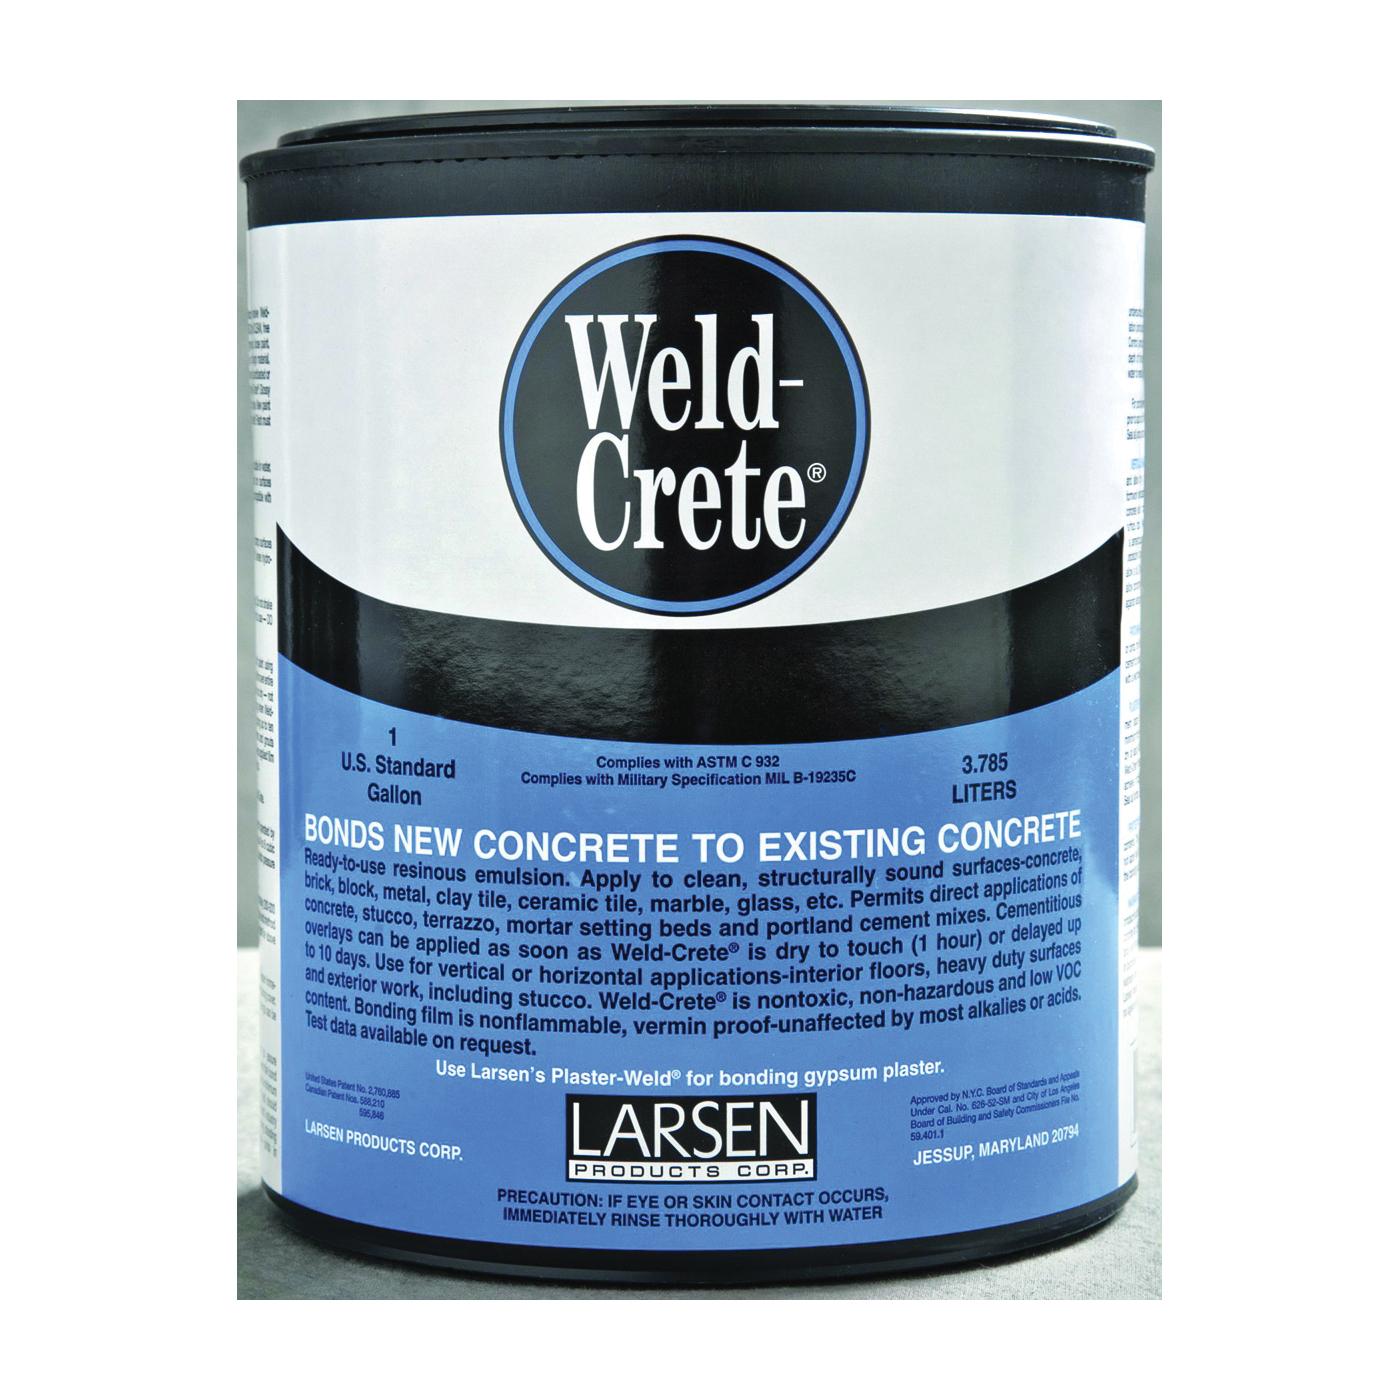 Picture of Larsen Weld-Crete WCG04 Bonding Agent, Liquid, Low to Slight Acetic, Blue, 1 gal Package, Pail